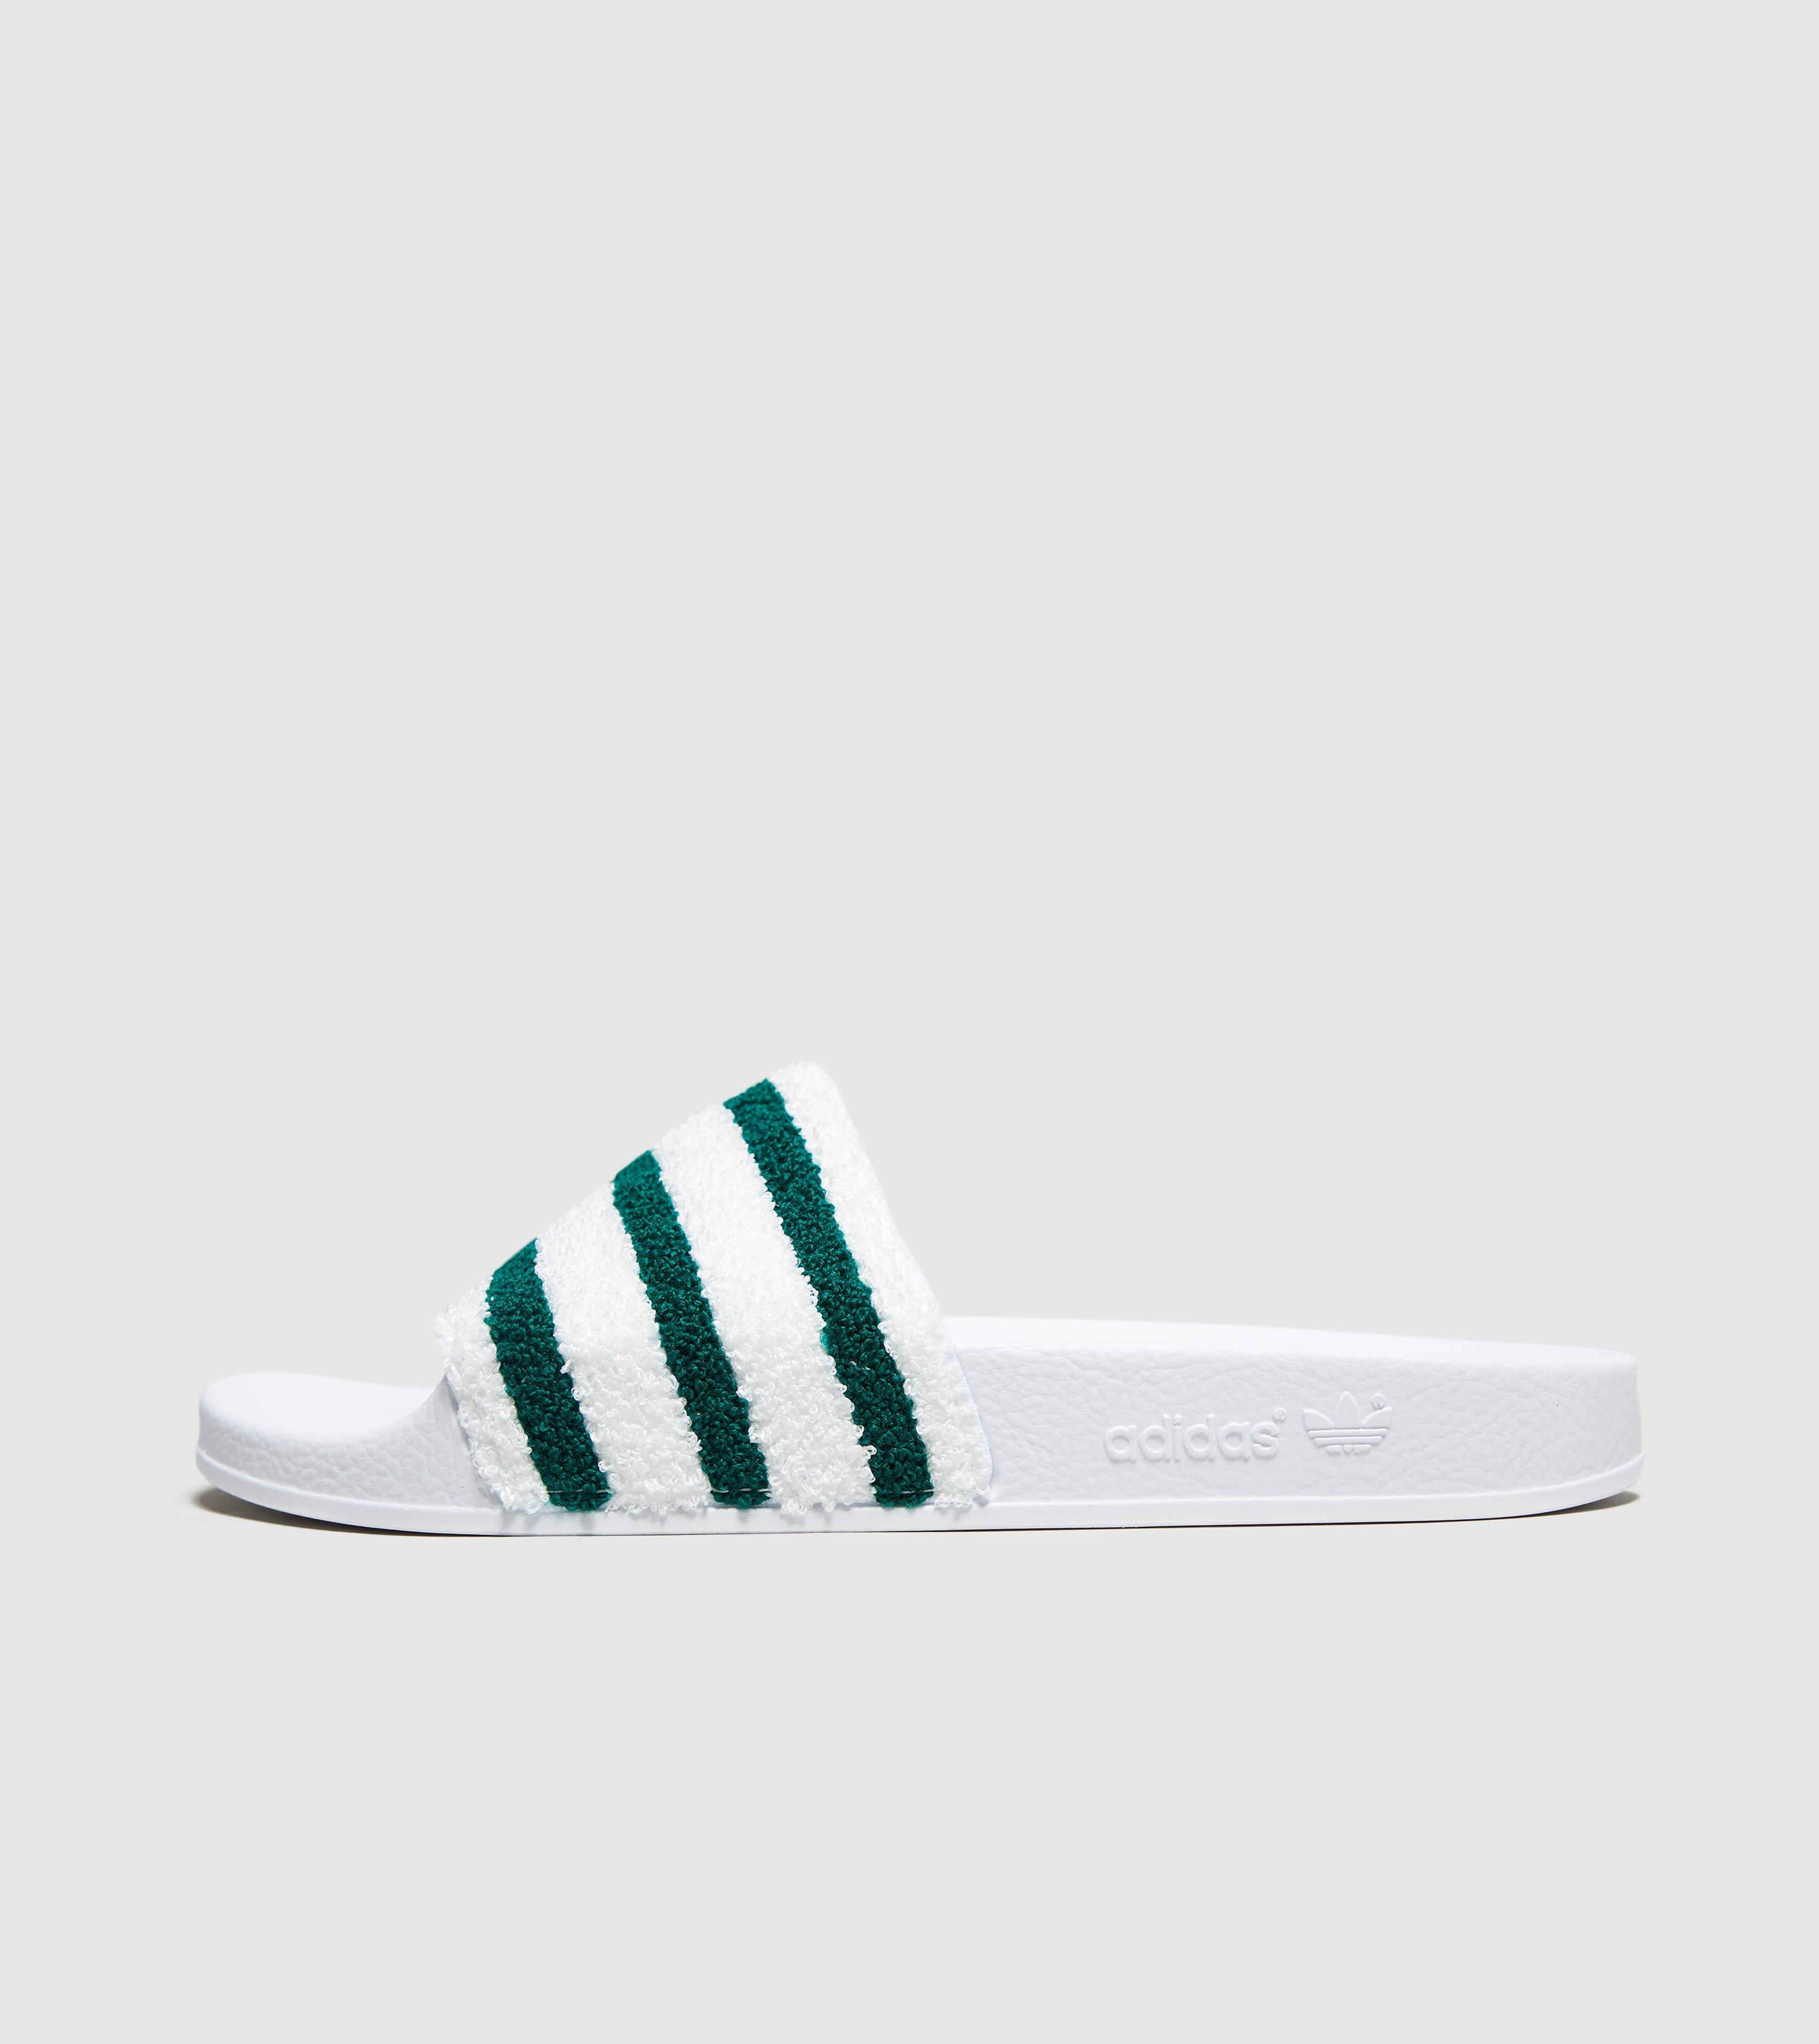 12369331617b Lyst - adidas Originals Adilette Towelling Slides in White